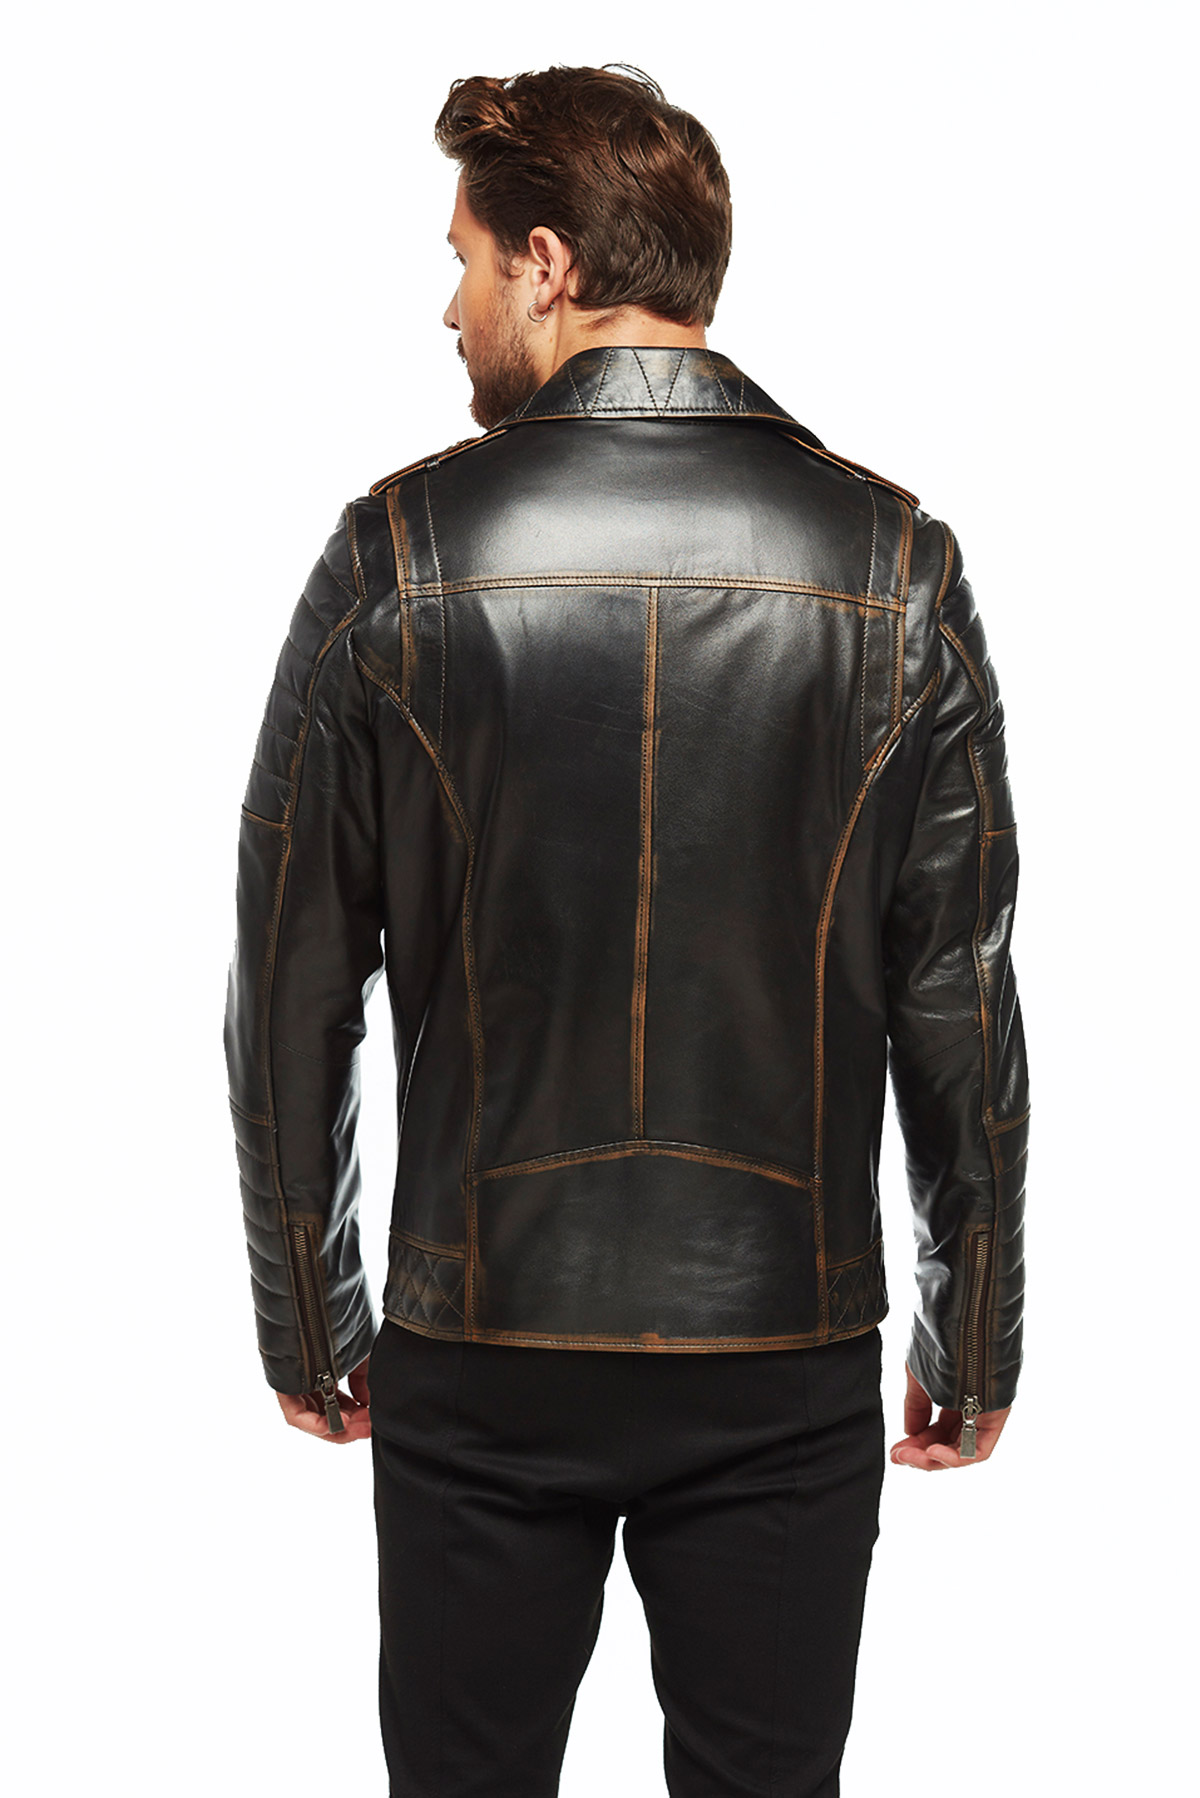 genuine leather harley davidson jacket